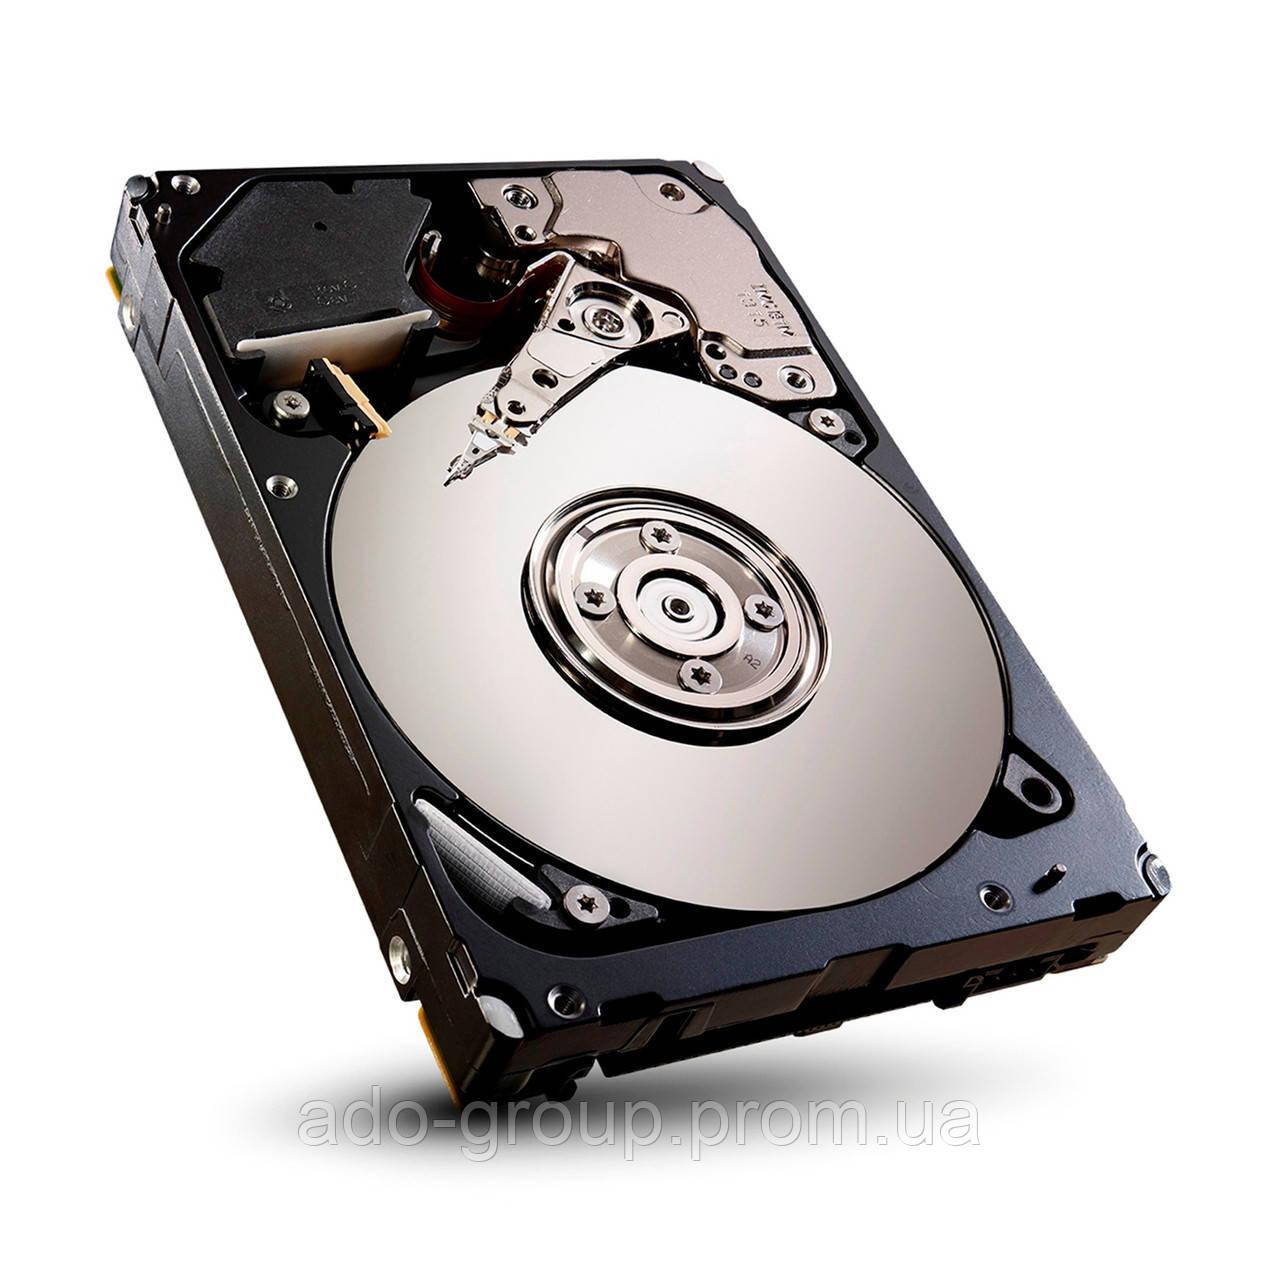 "GP880 Жесткий диск Dell 300Gb SAS 15K  3.5"" +"